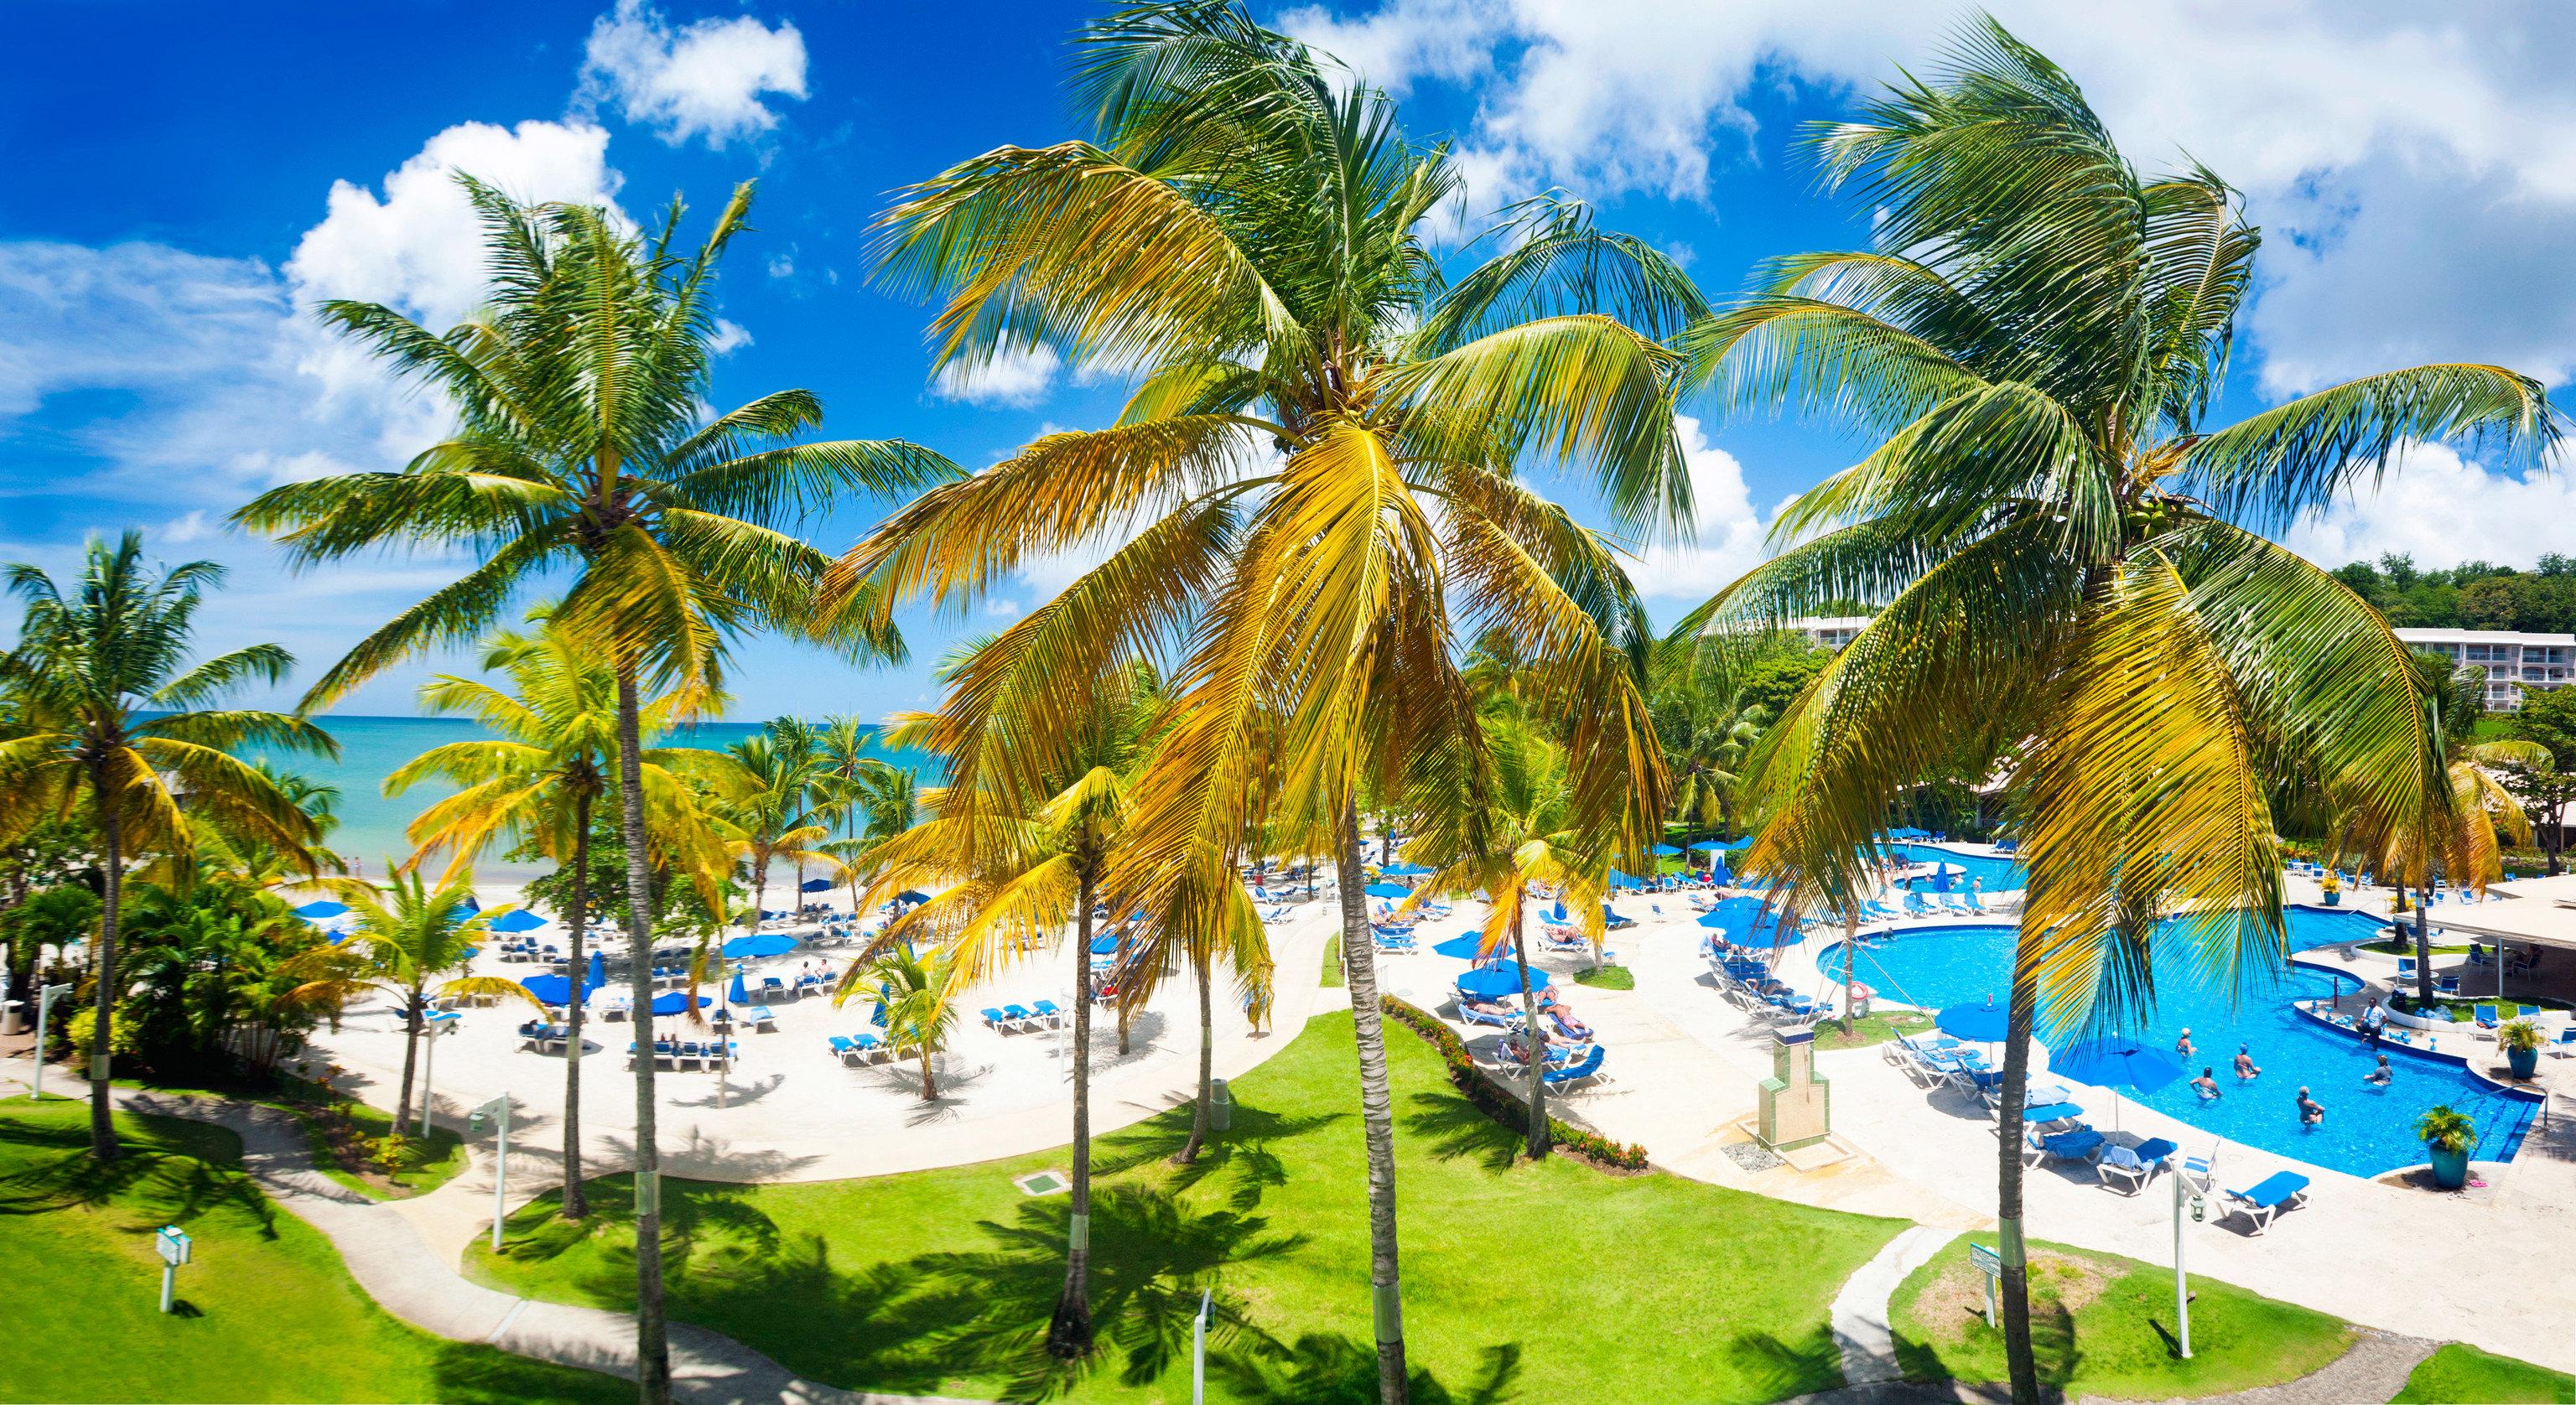 Club Morgan Bay St Lucia Caribbean